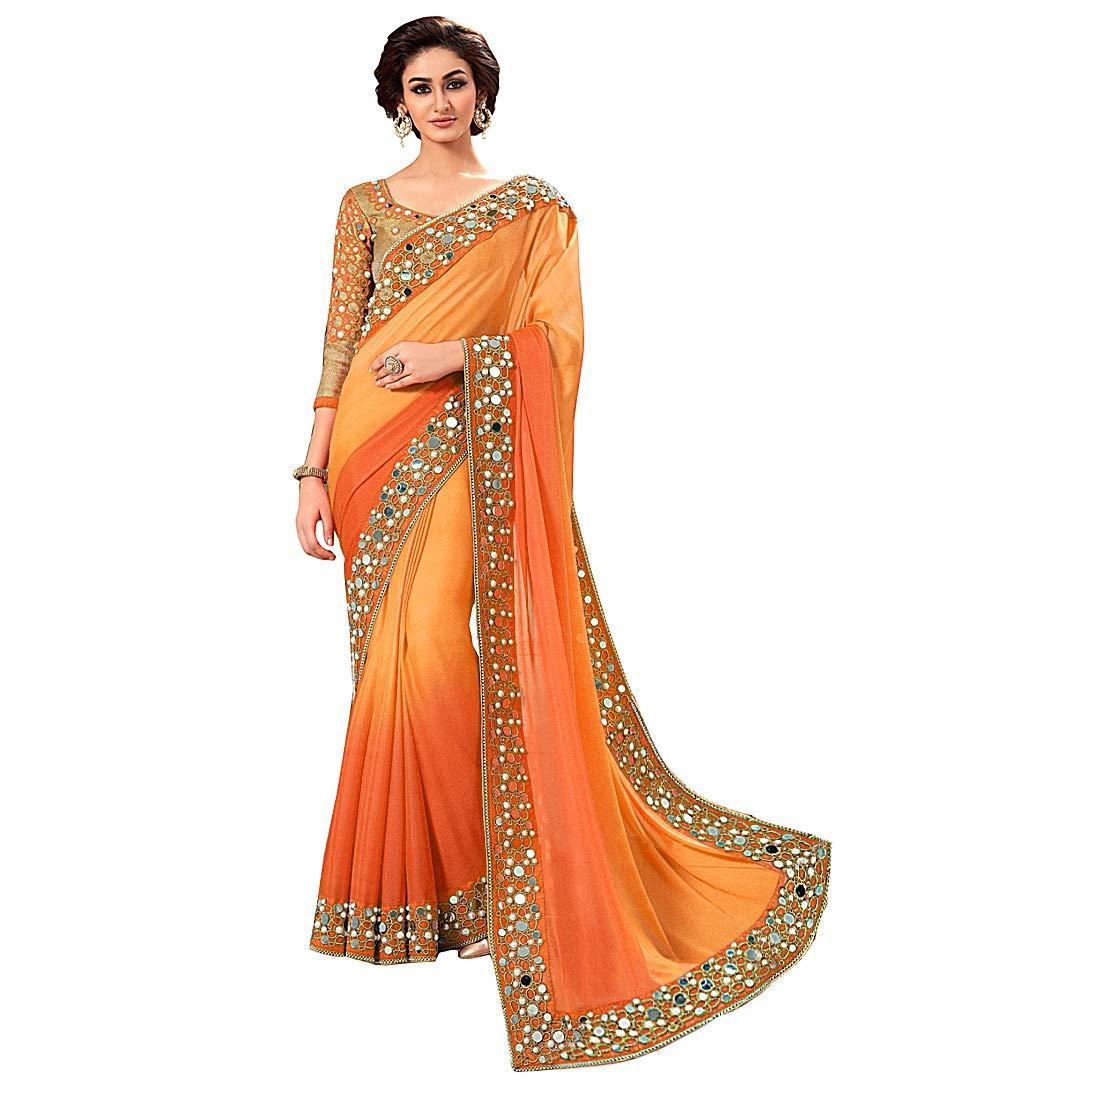 165696050f7e95 jashvi creation Women s Georgette Solid Saree with Blouse Piece ...